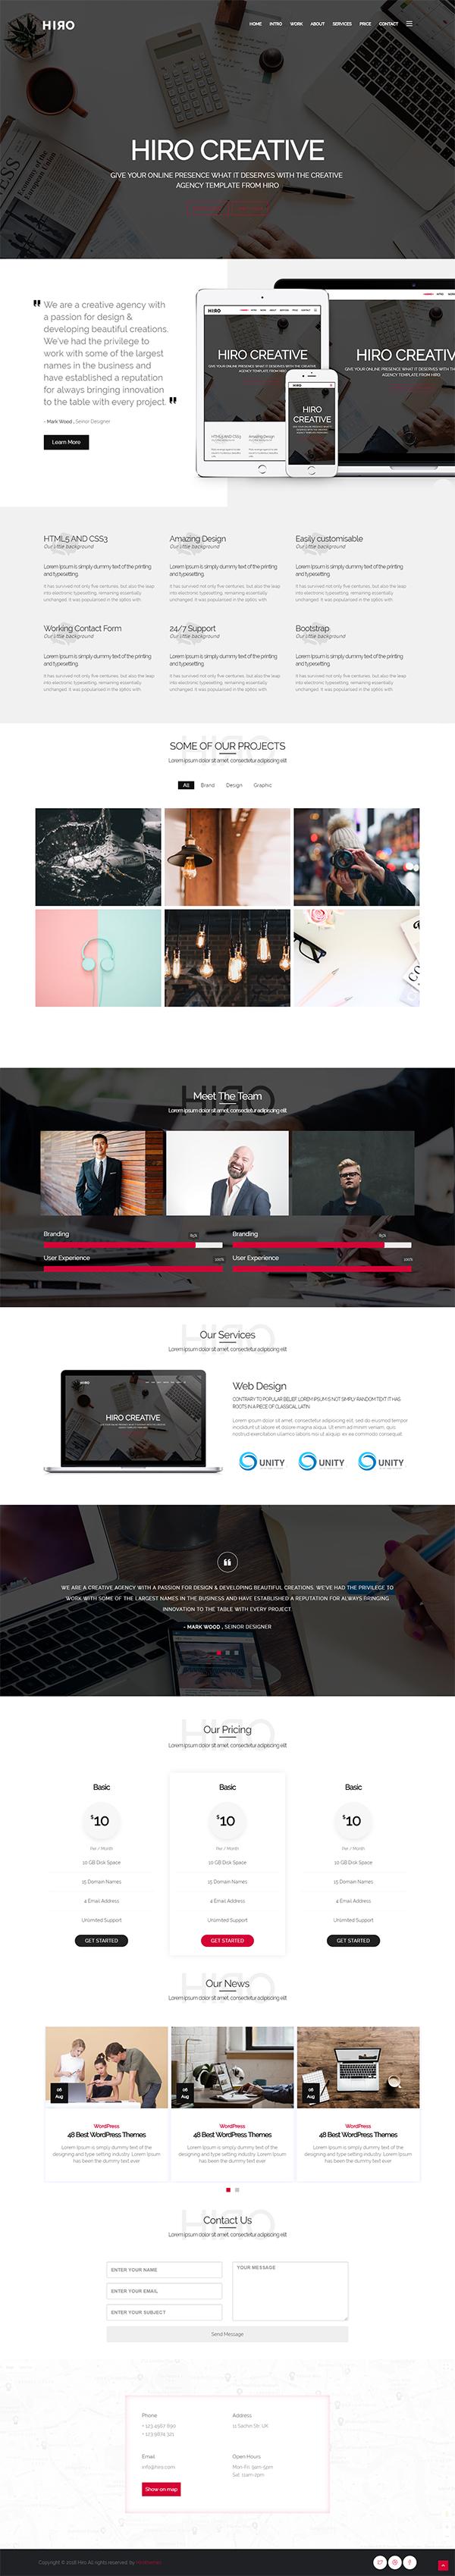 Hiro - Creative agency HTML5 Template